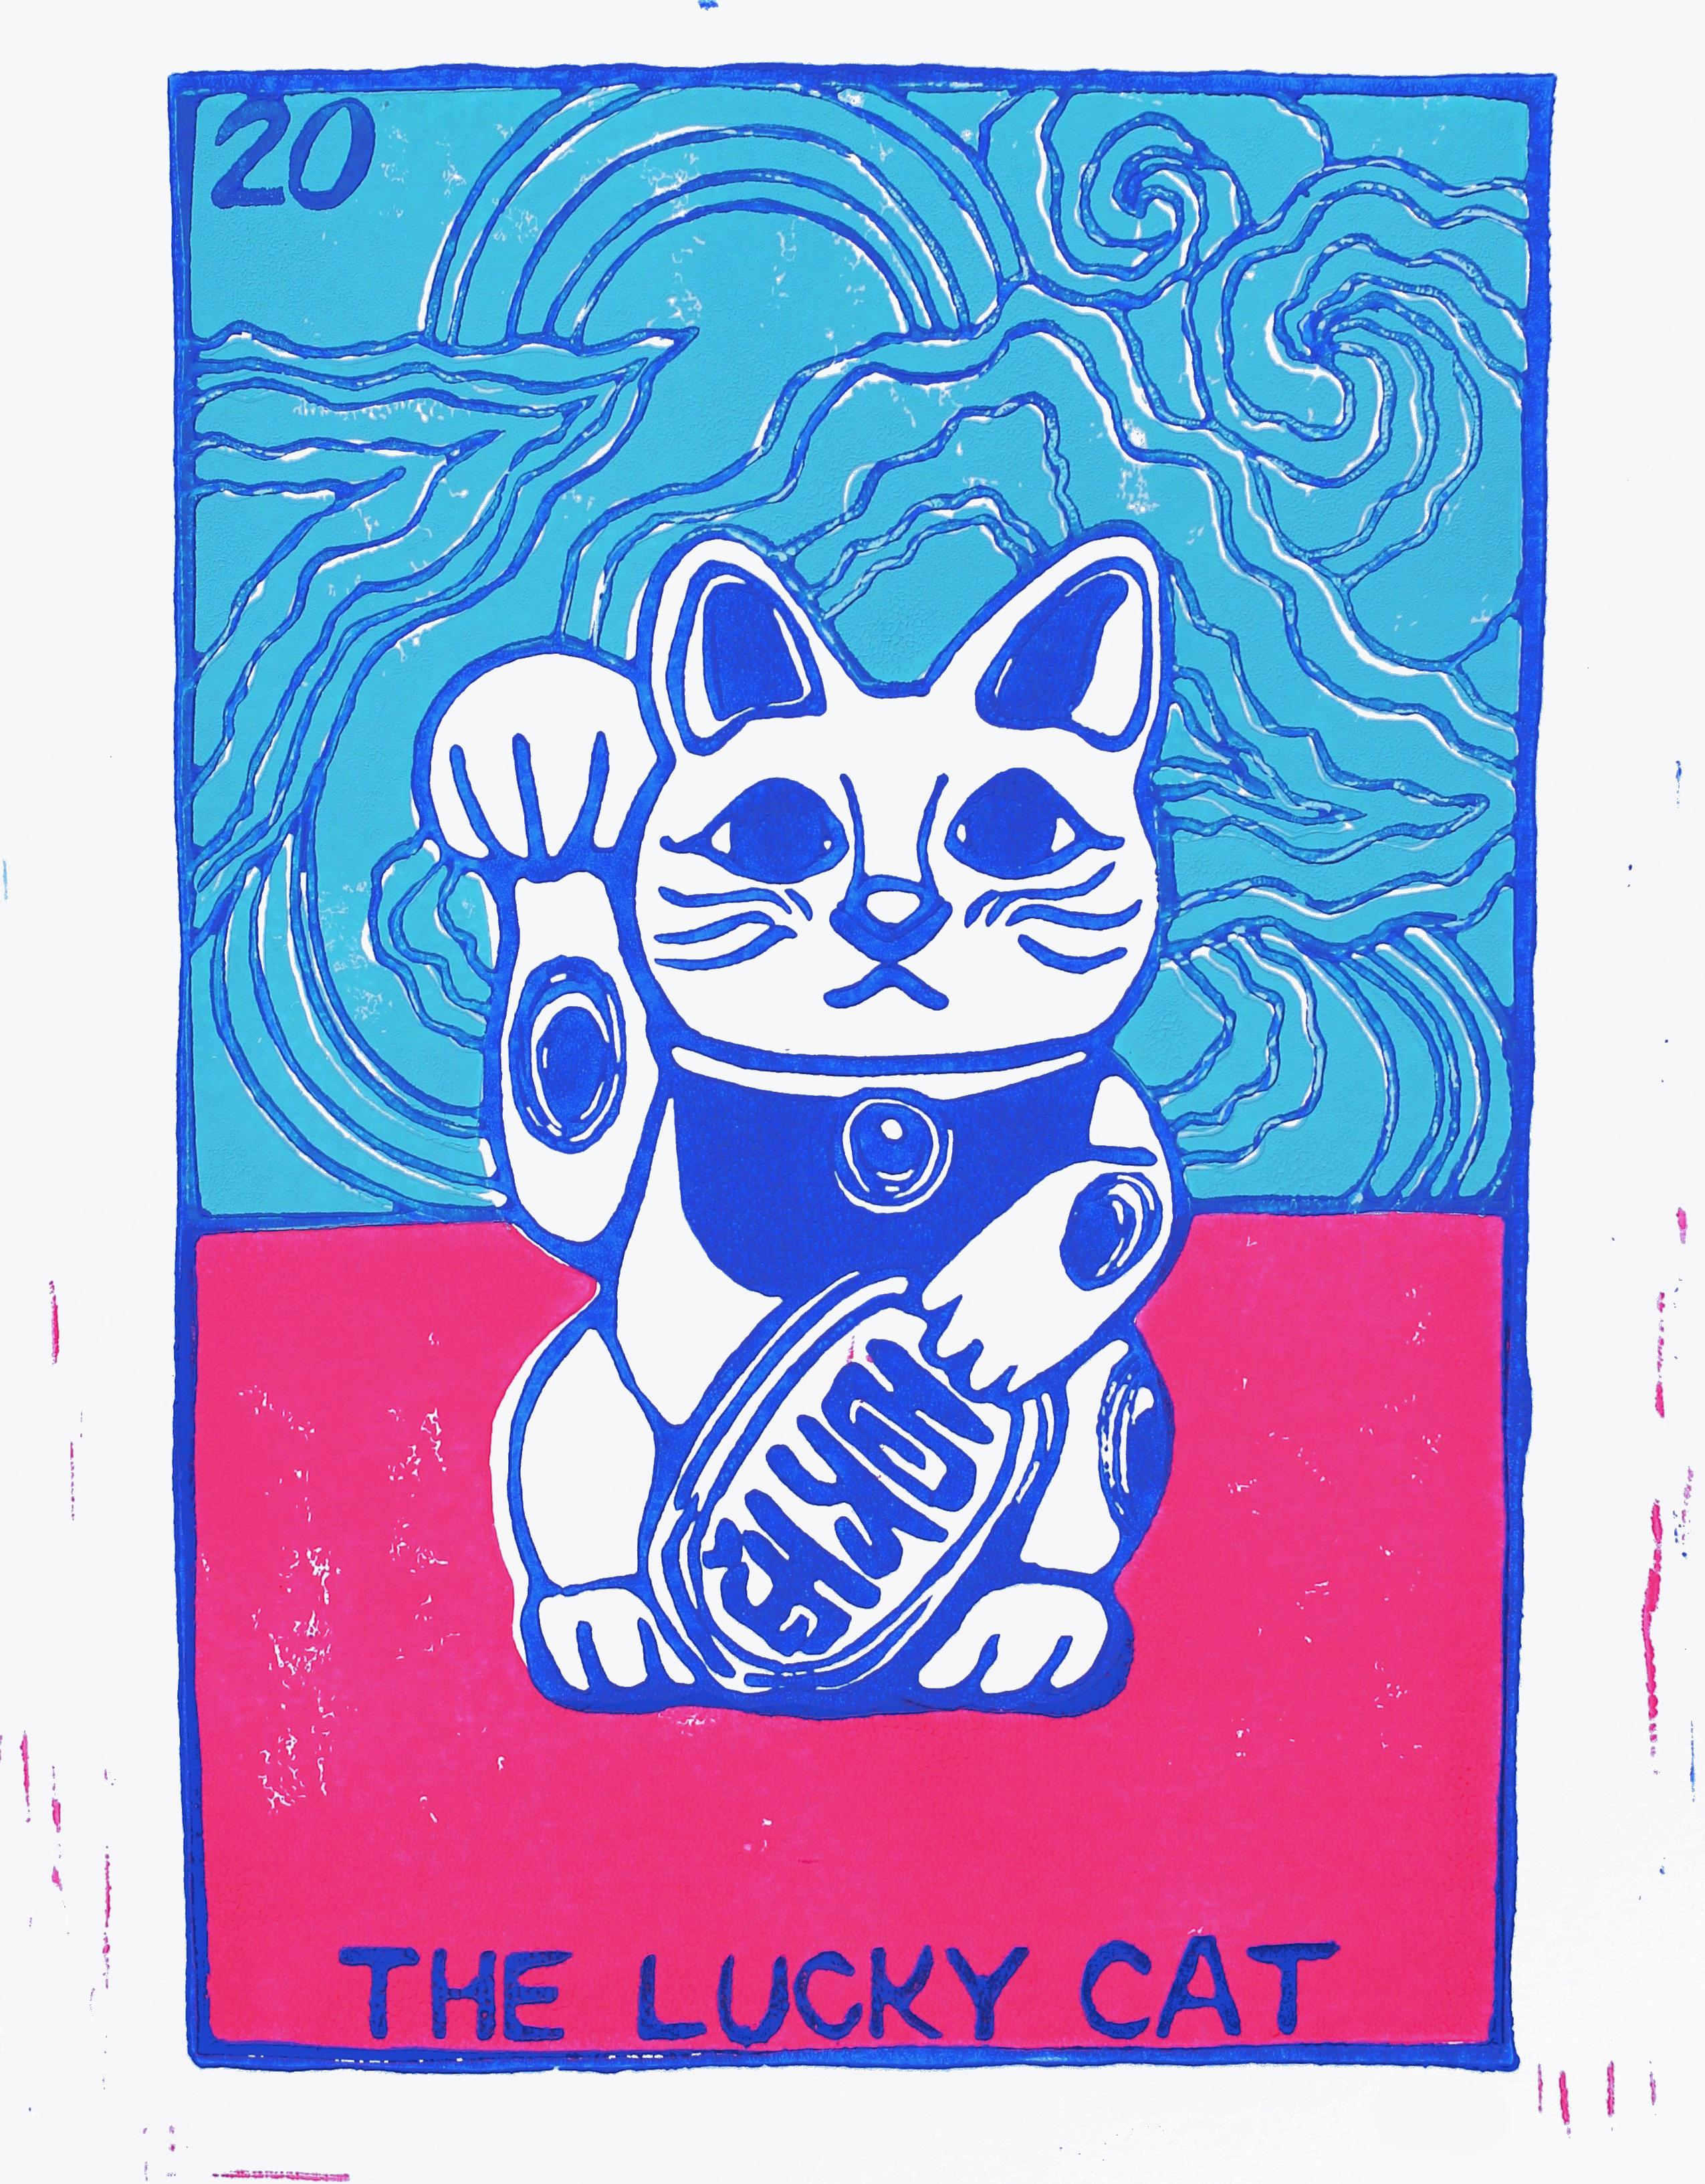 LUCKY CAT, linocut print on paper, 2020.